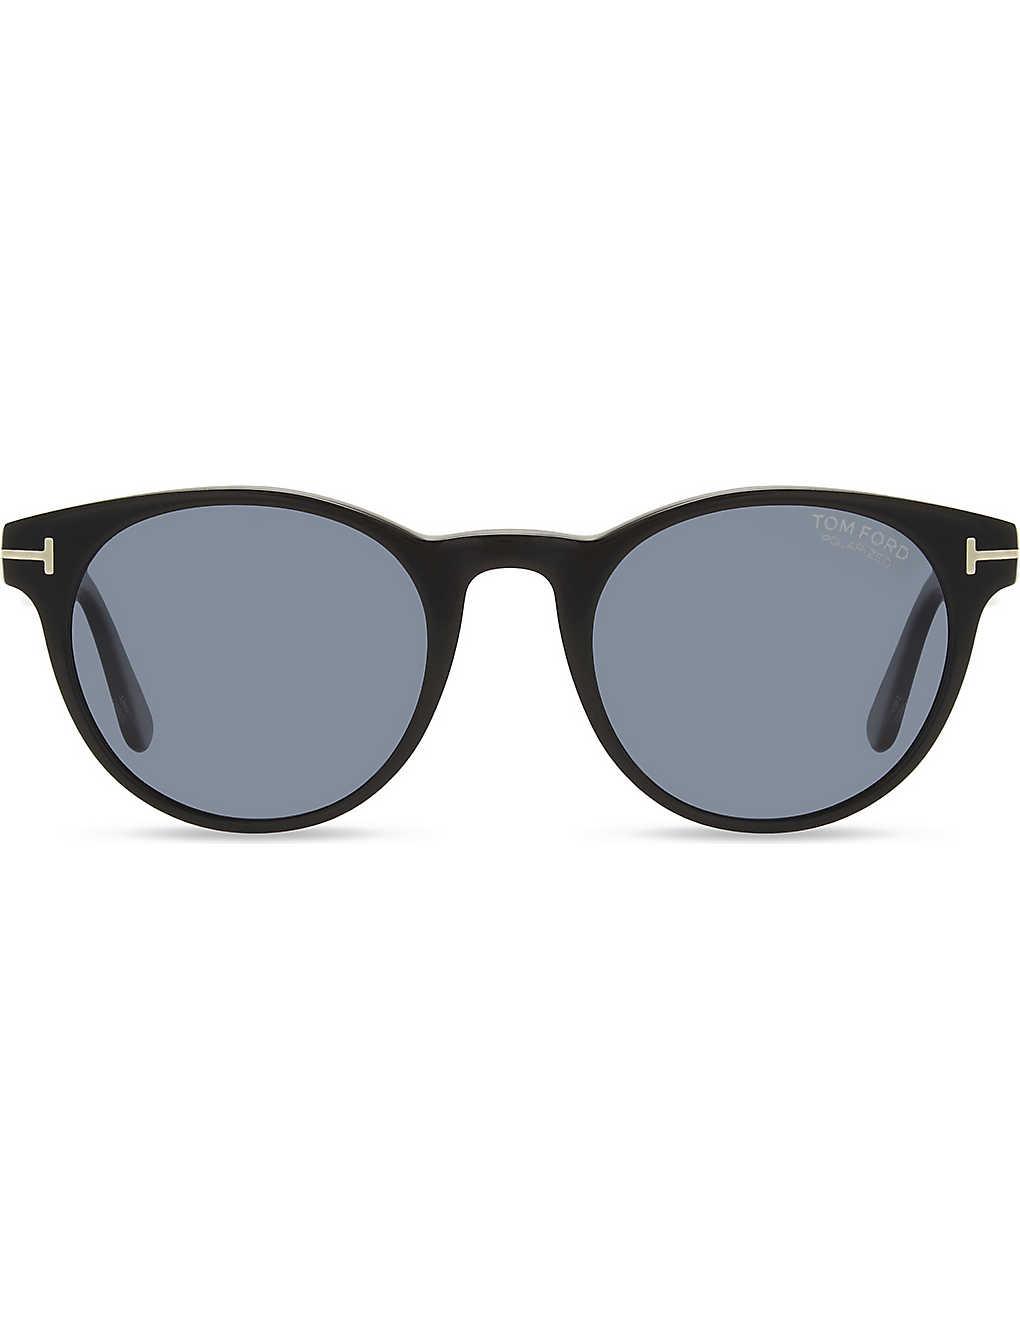 f5479972d9719 TOM FORD - Palmer TF522 round sunglasses